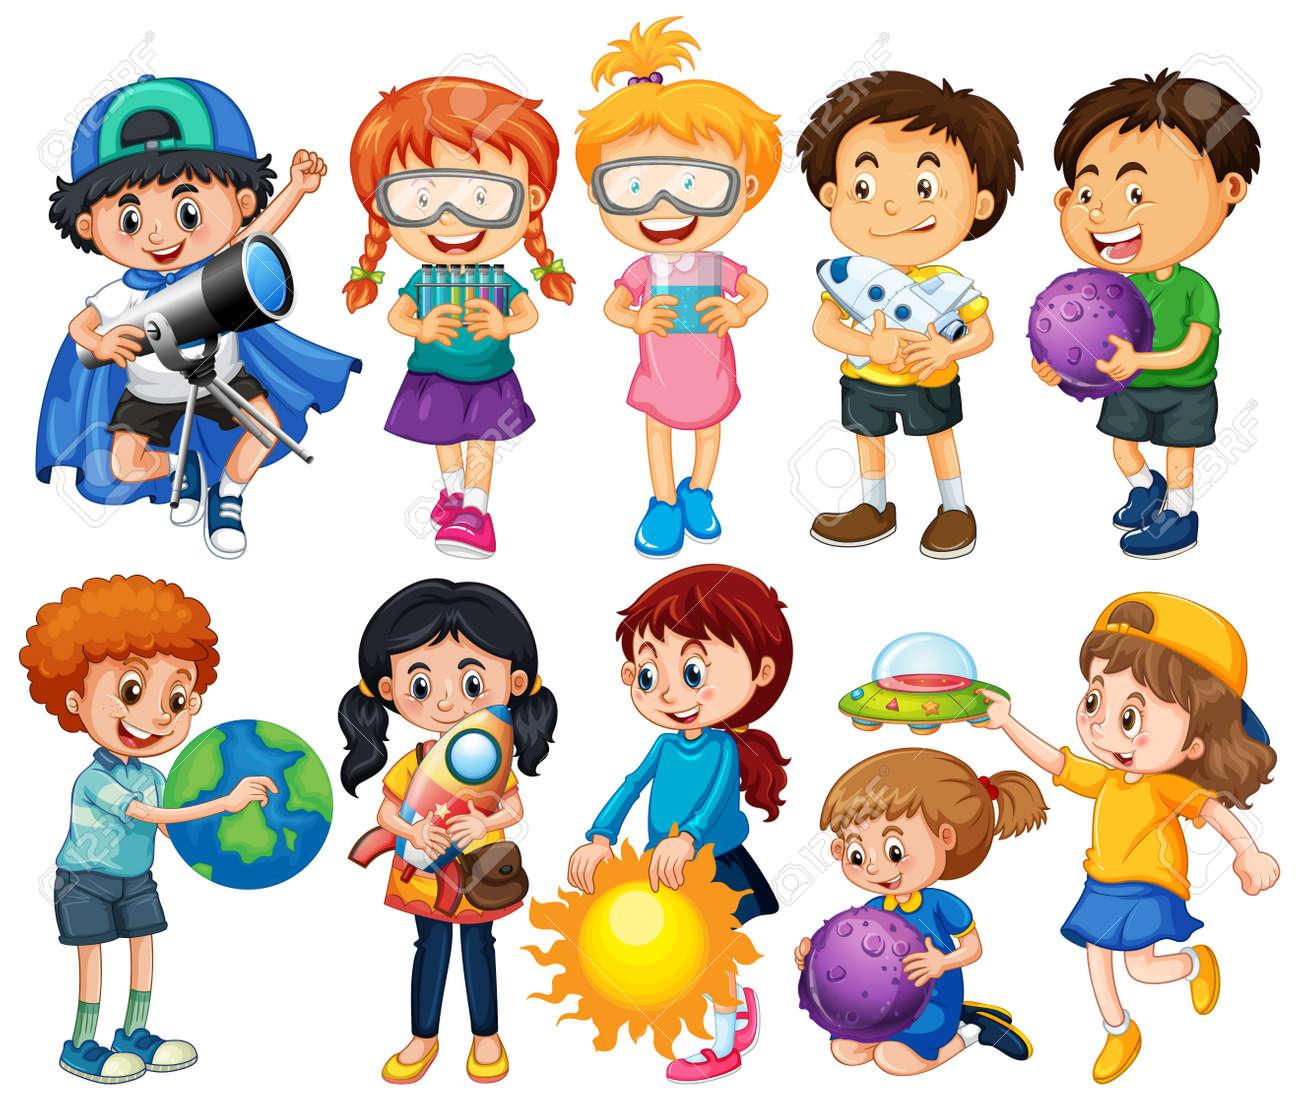 Group of children cartoon character illustration - 159386511